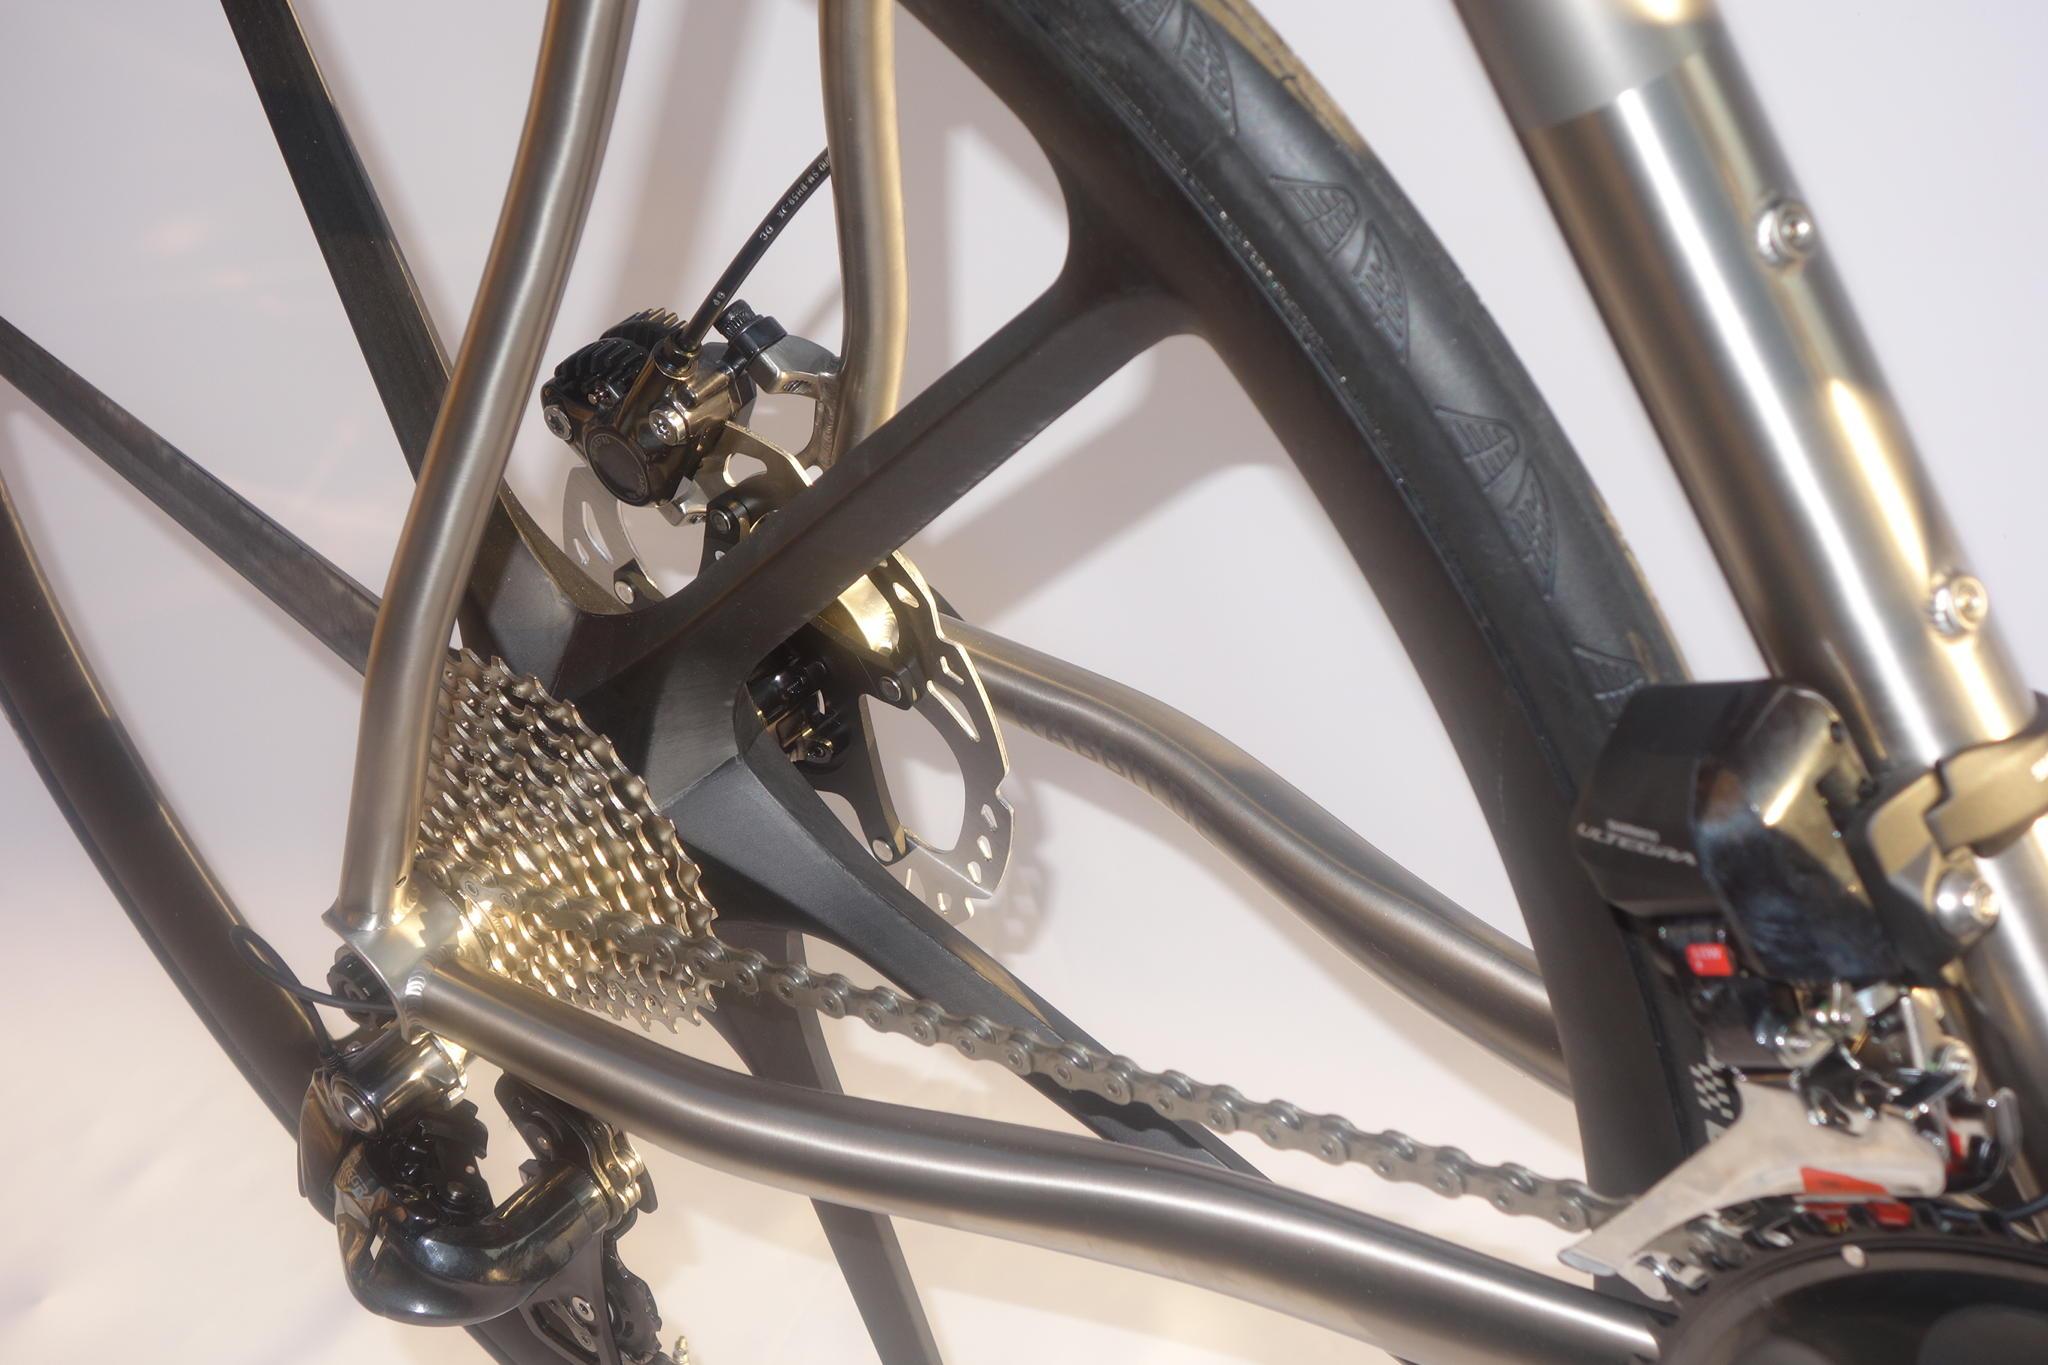 rabbit_cycles_titan_road_disc_dsc03462